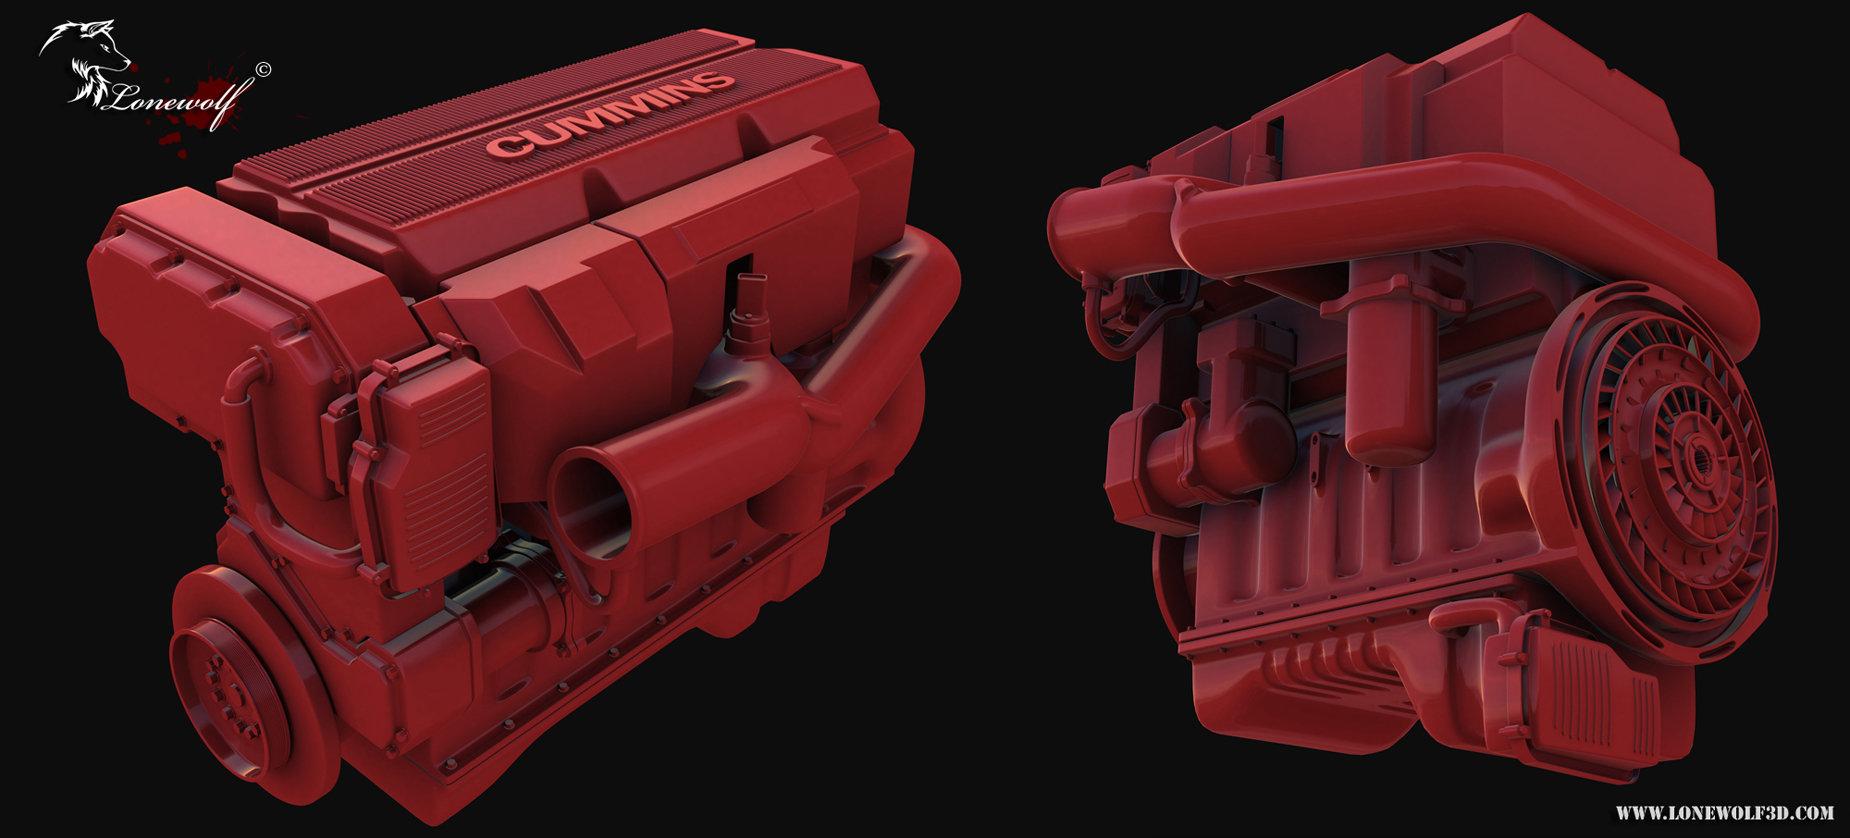 Grimlock transformers tf4 05